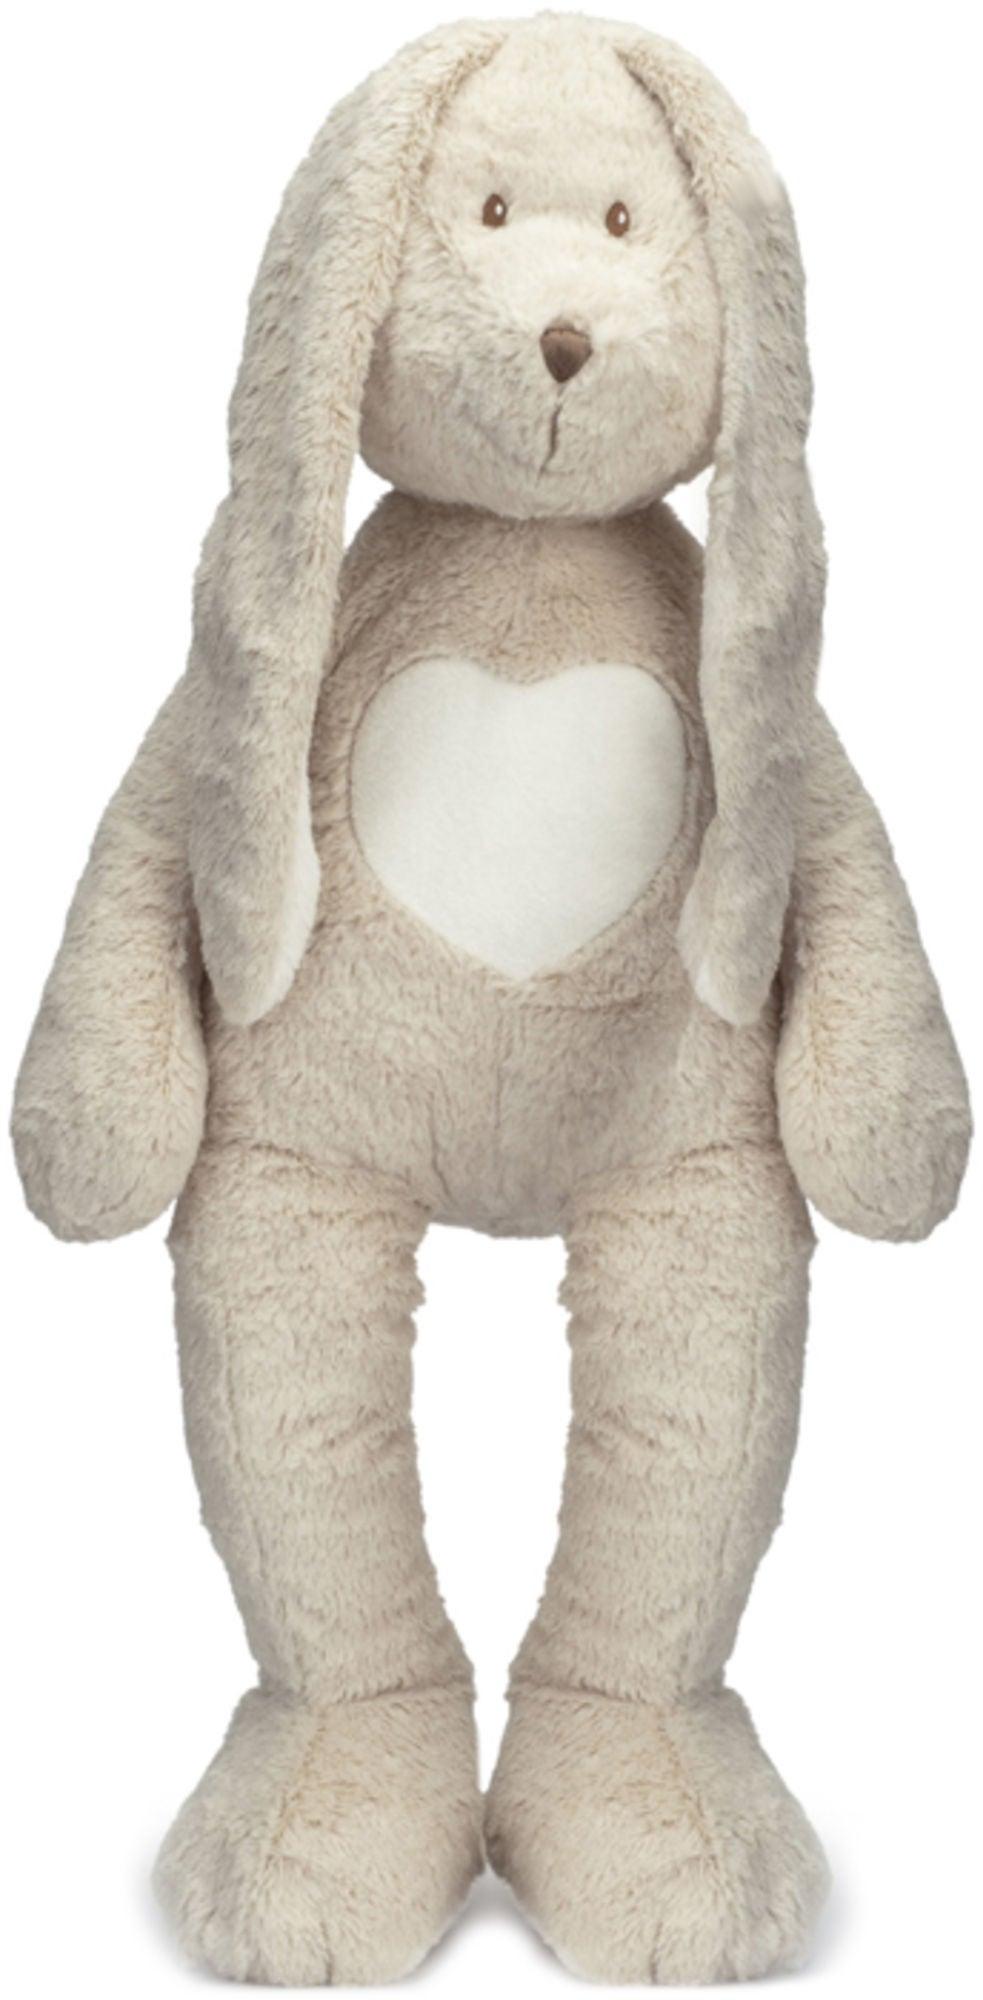 Teddykompaniet Gosedjur Kanin Teddy Cream Grå